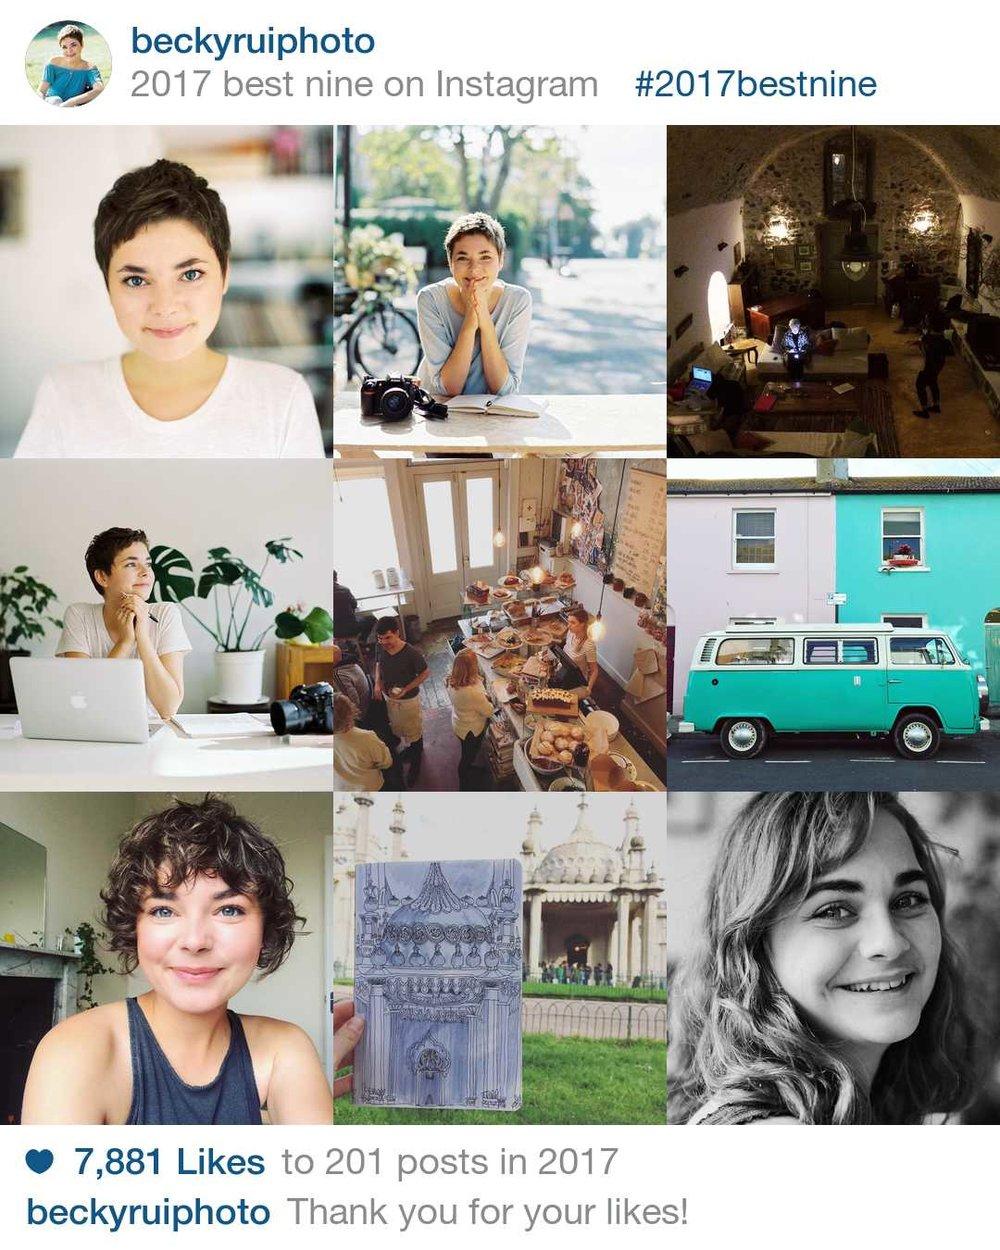 Beckyruiphoto best nine 2017 personal branding photographer